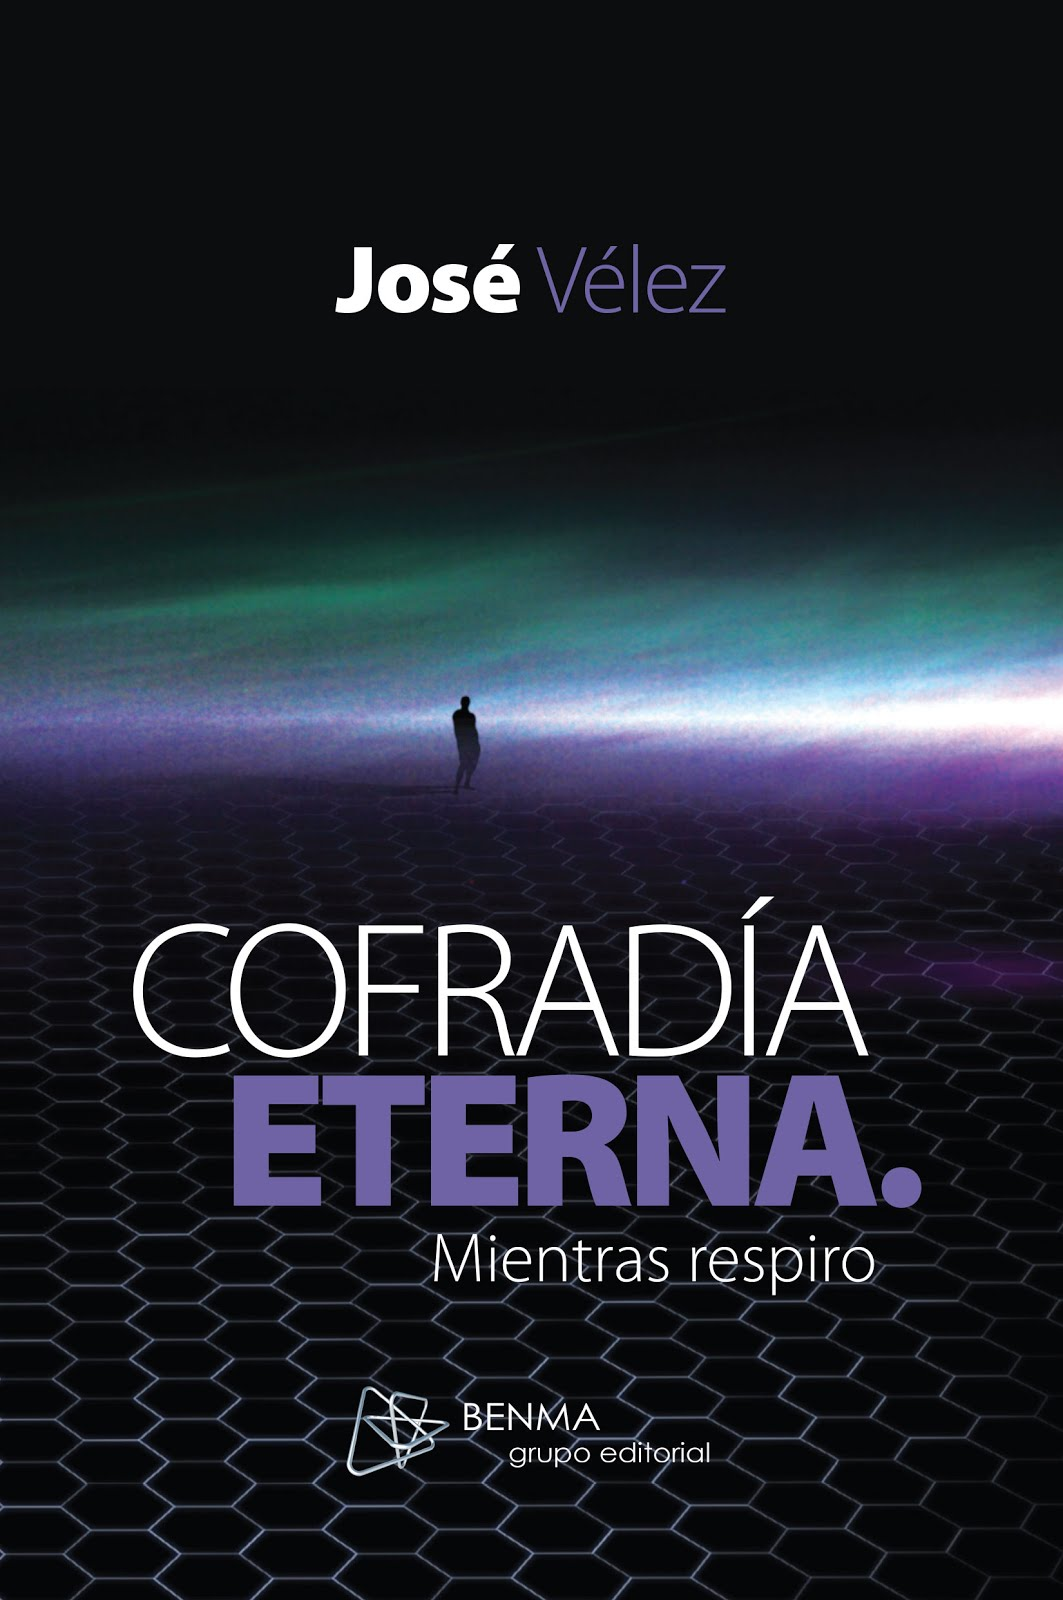 JOSÉ VÉLEZ, escritor